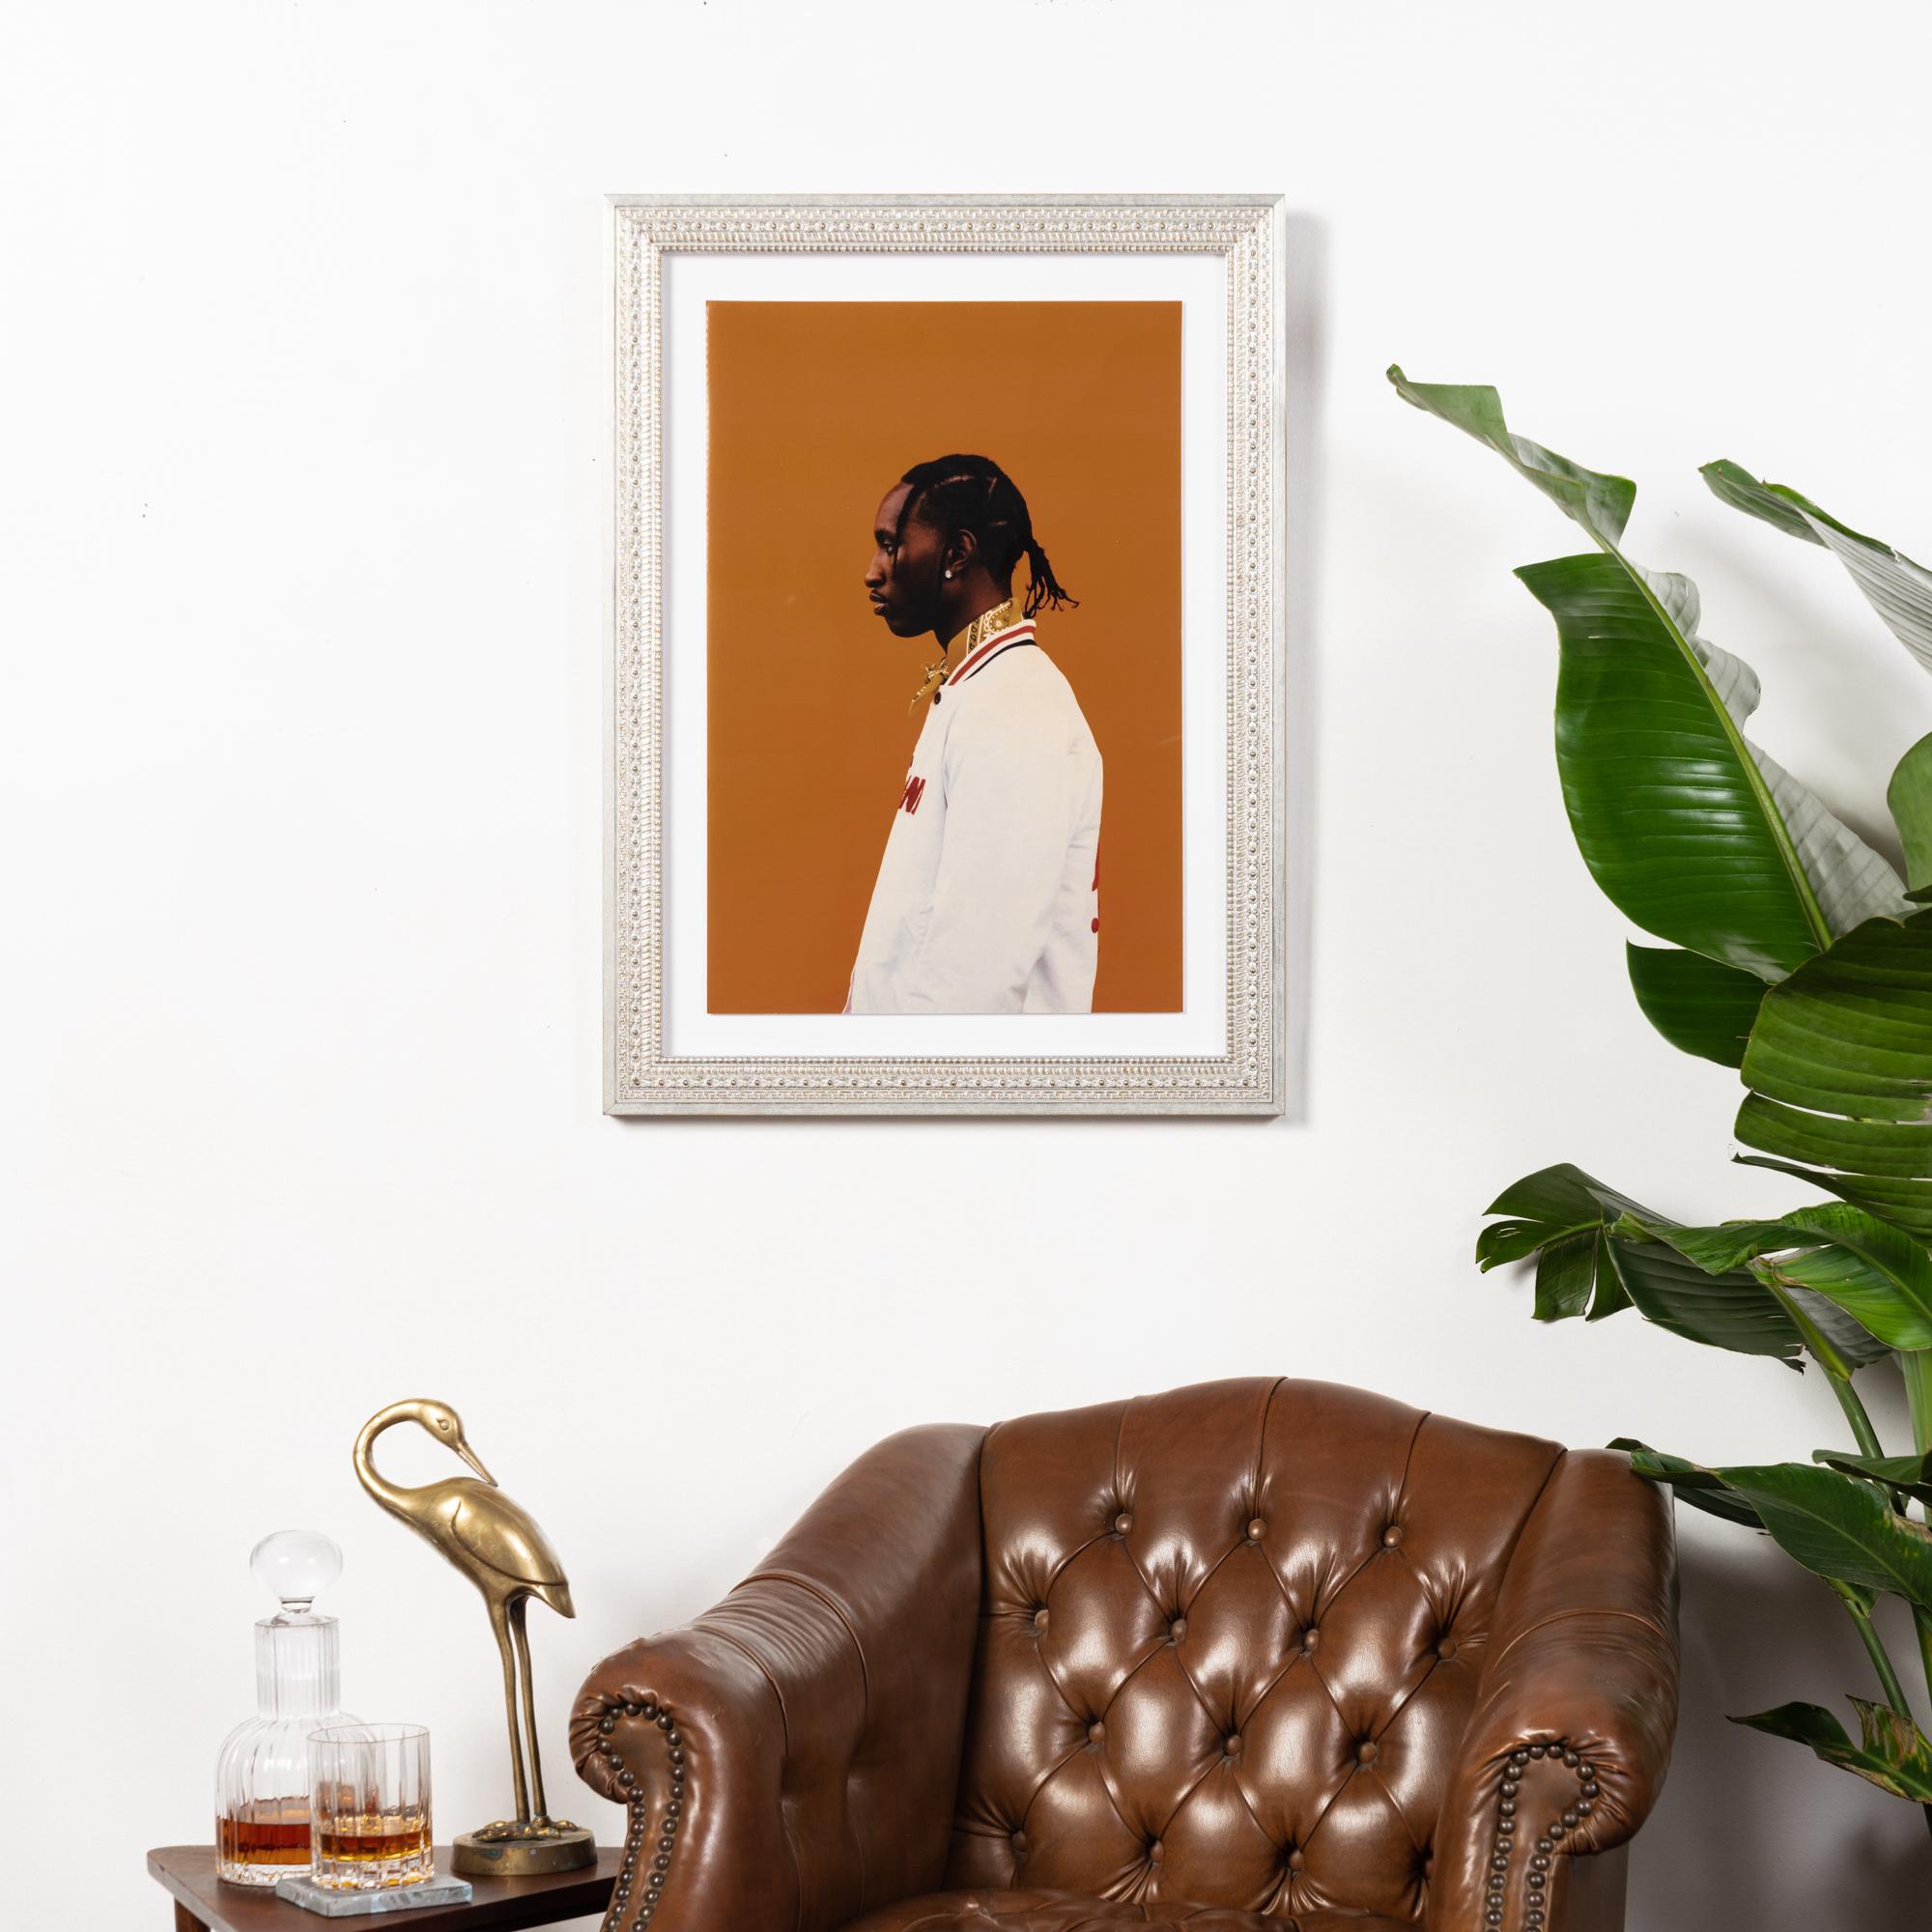 Framebridge Black Artists Print Shop Wulf Bradley Yosemite framed print Brighton frame